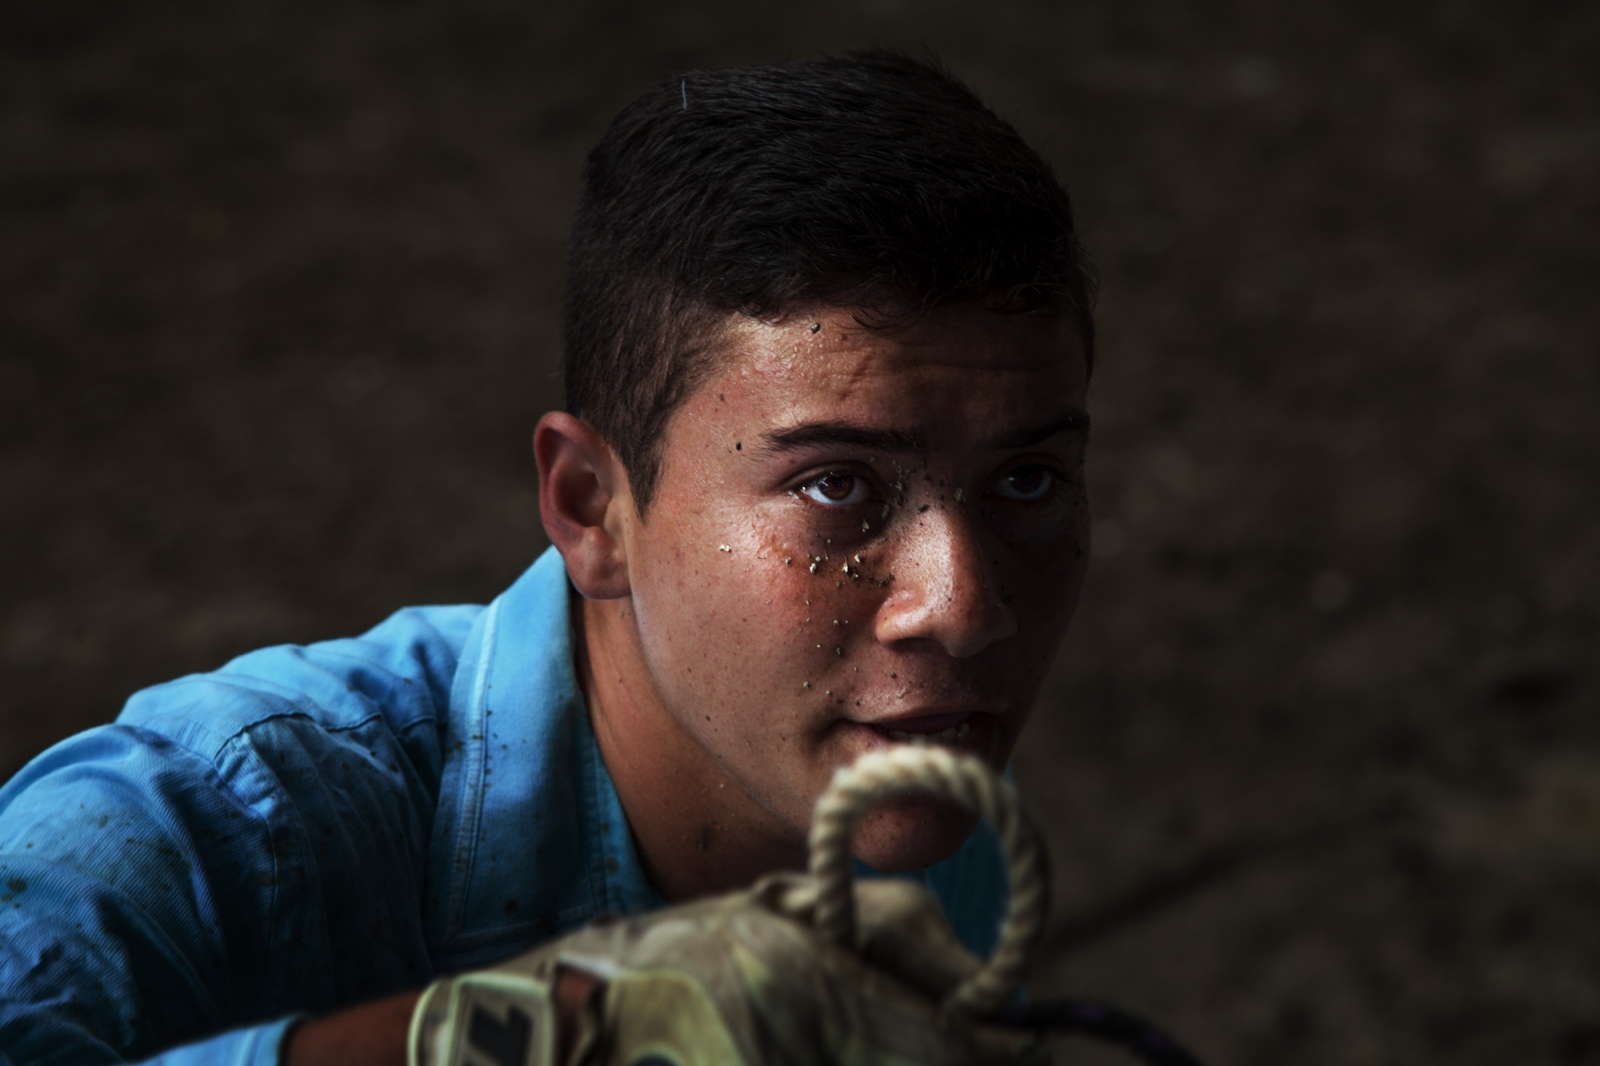 Art and Documentary Photography - Loading 015_Venezuela_WilRiera_Candidate.jpg